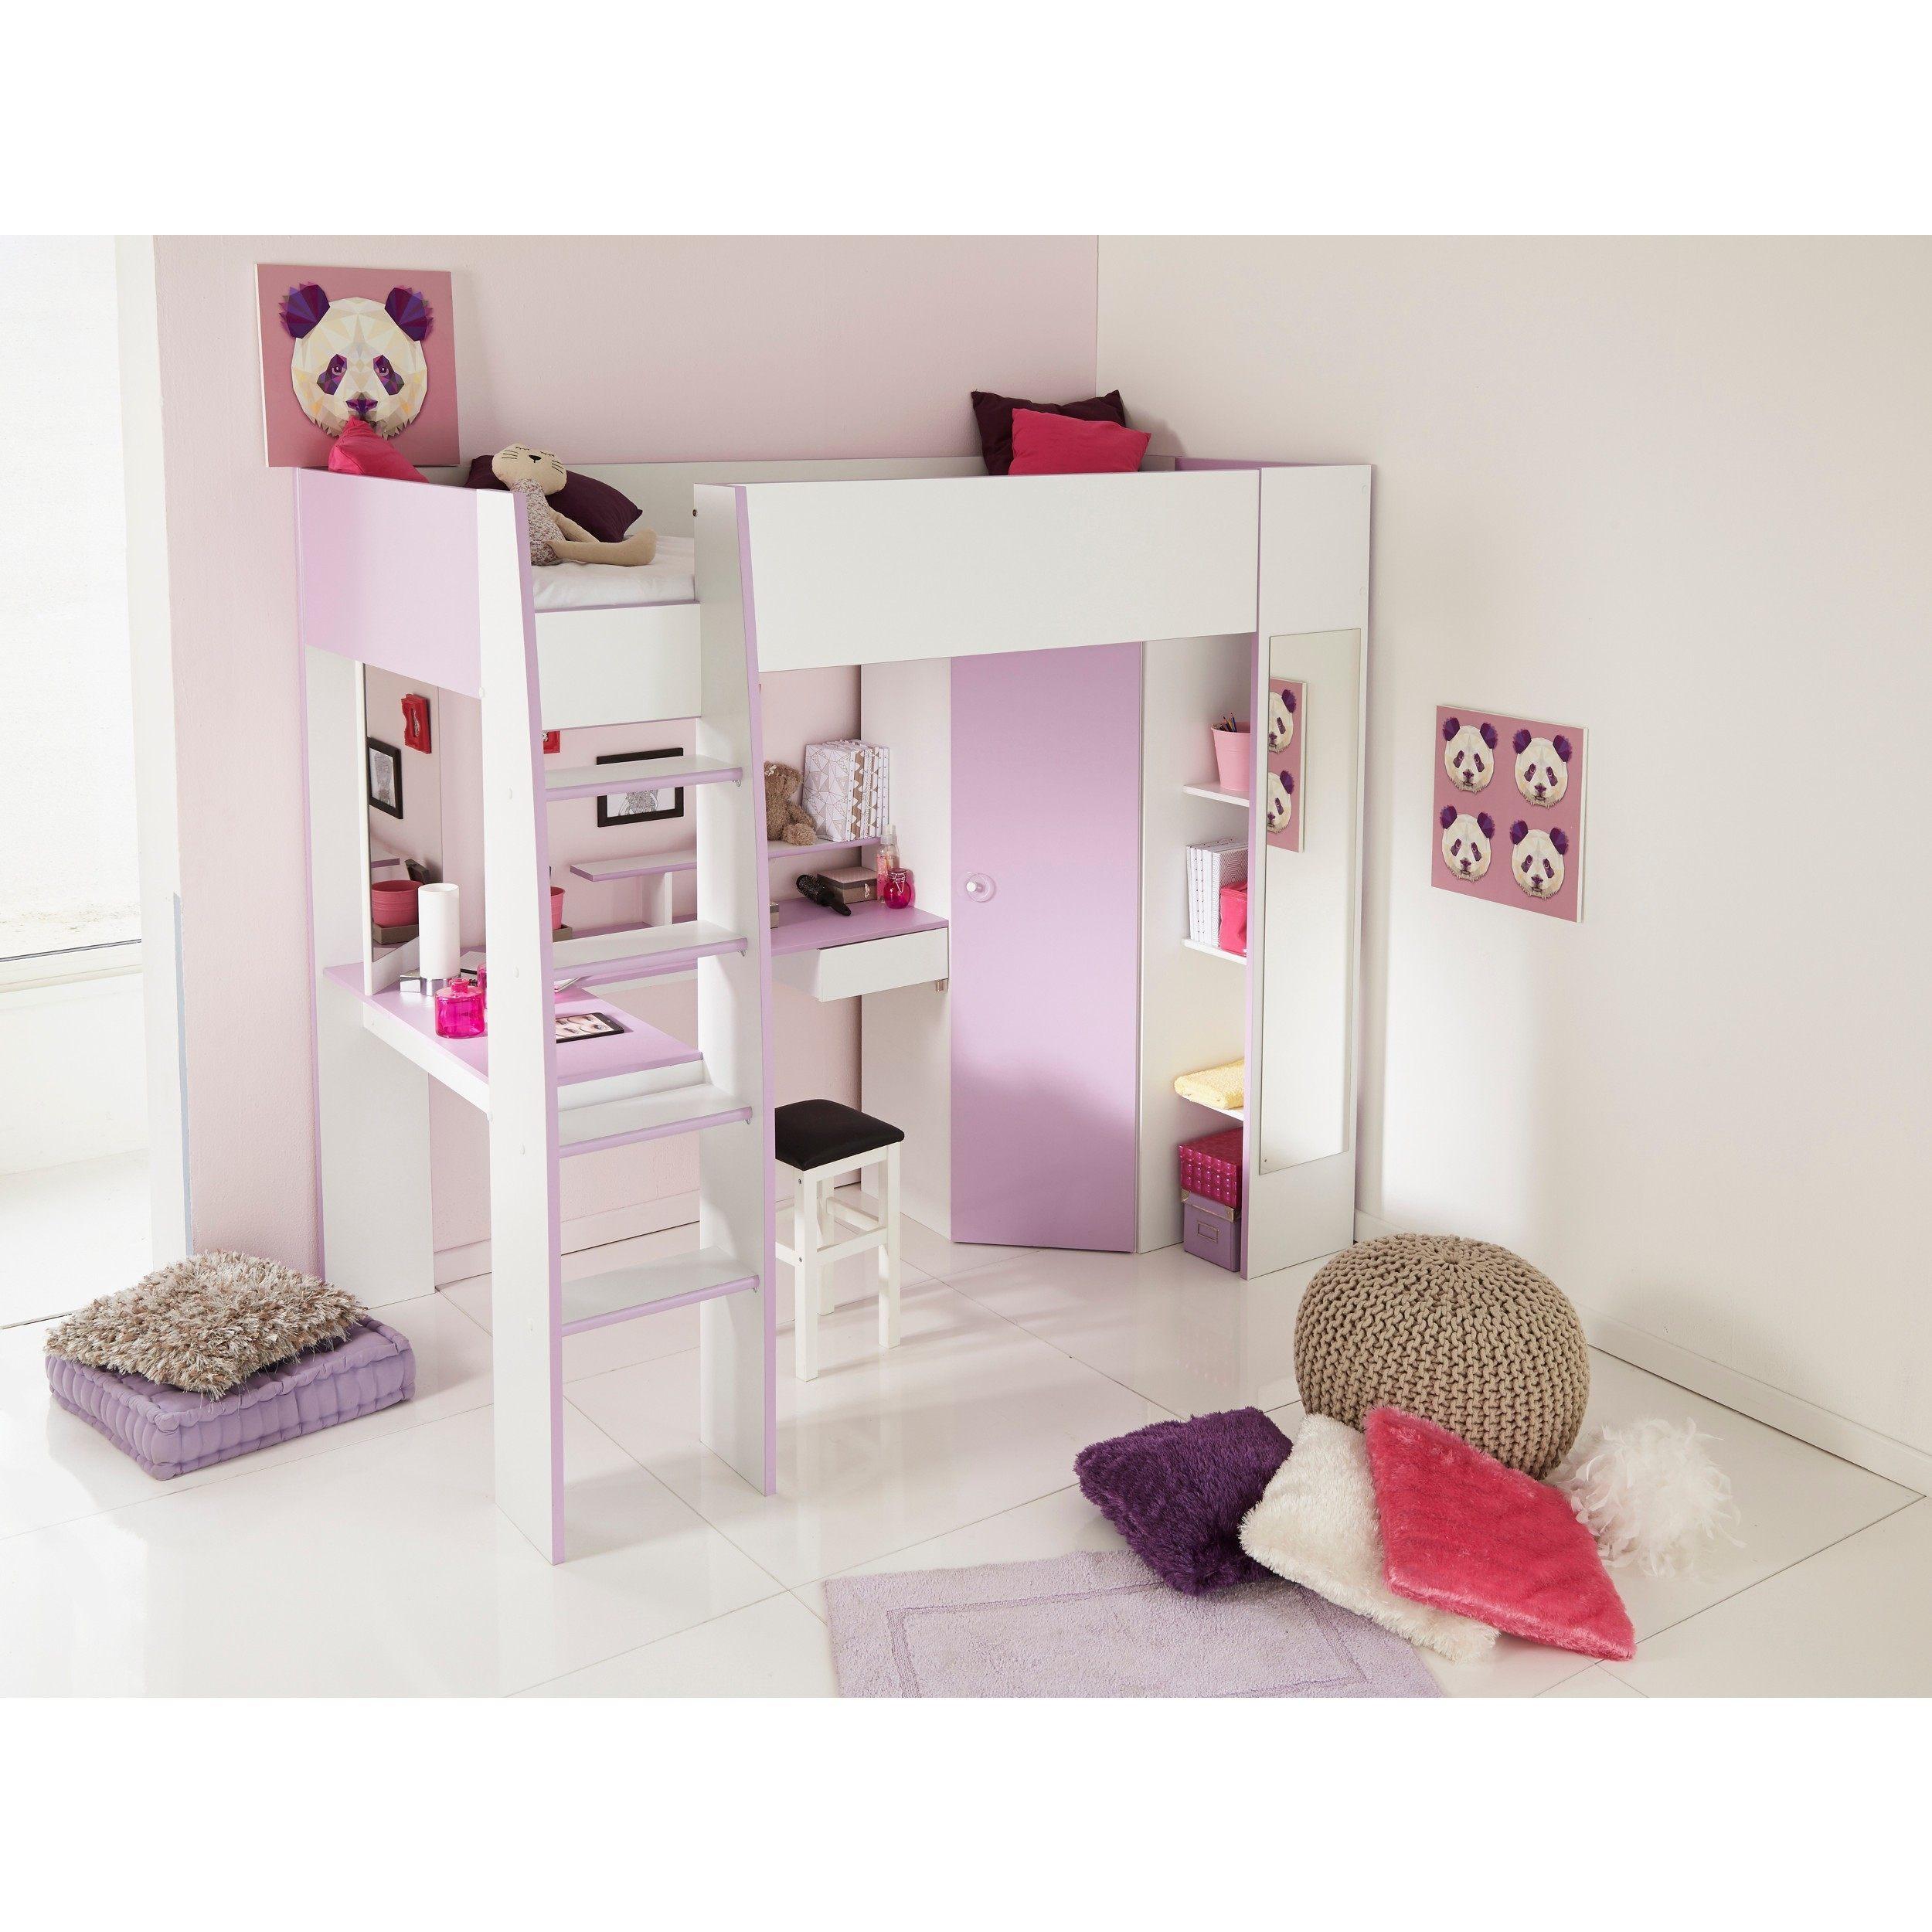 Lit Enfant Mi Hauteur Beau Lit Mezzanine Ikea Stuva Bureau Lit Mezzanine Ikea Enfant 21 3